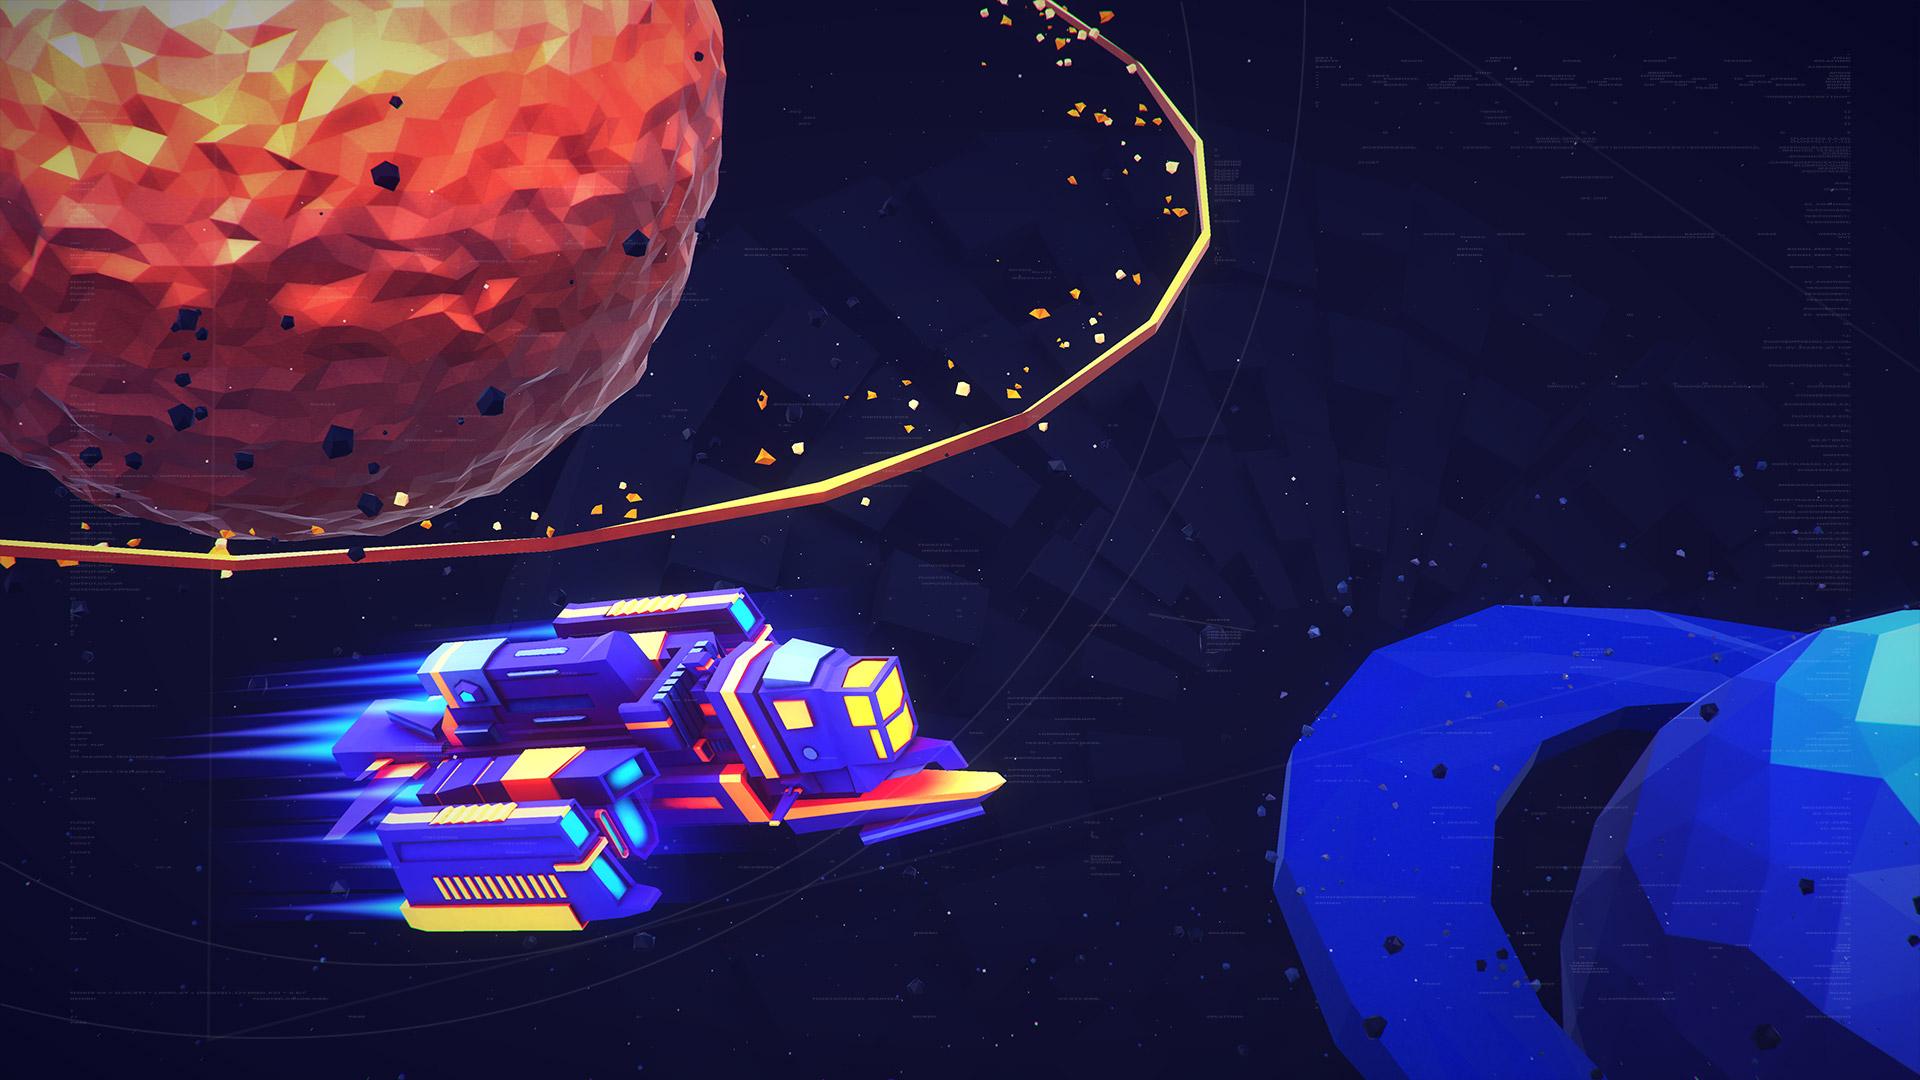 Space_Journey_Unity3D_AssetStore_Planets.jpg